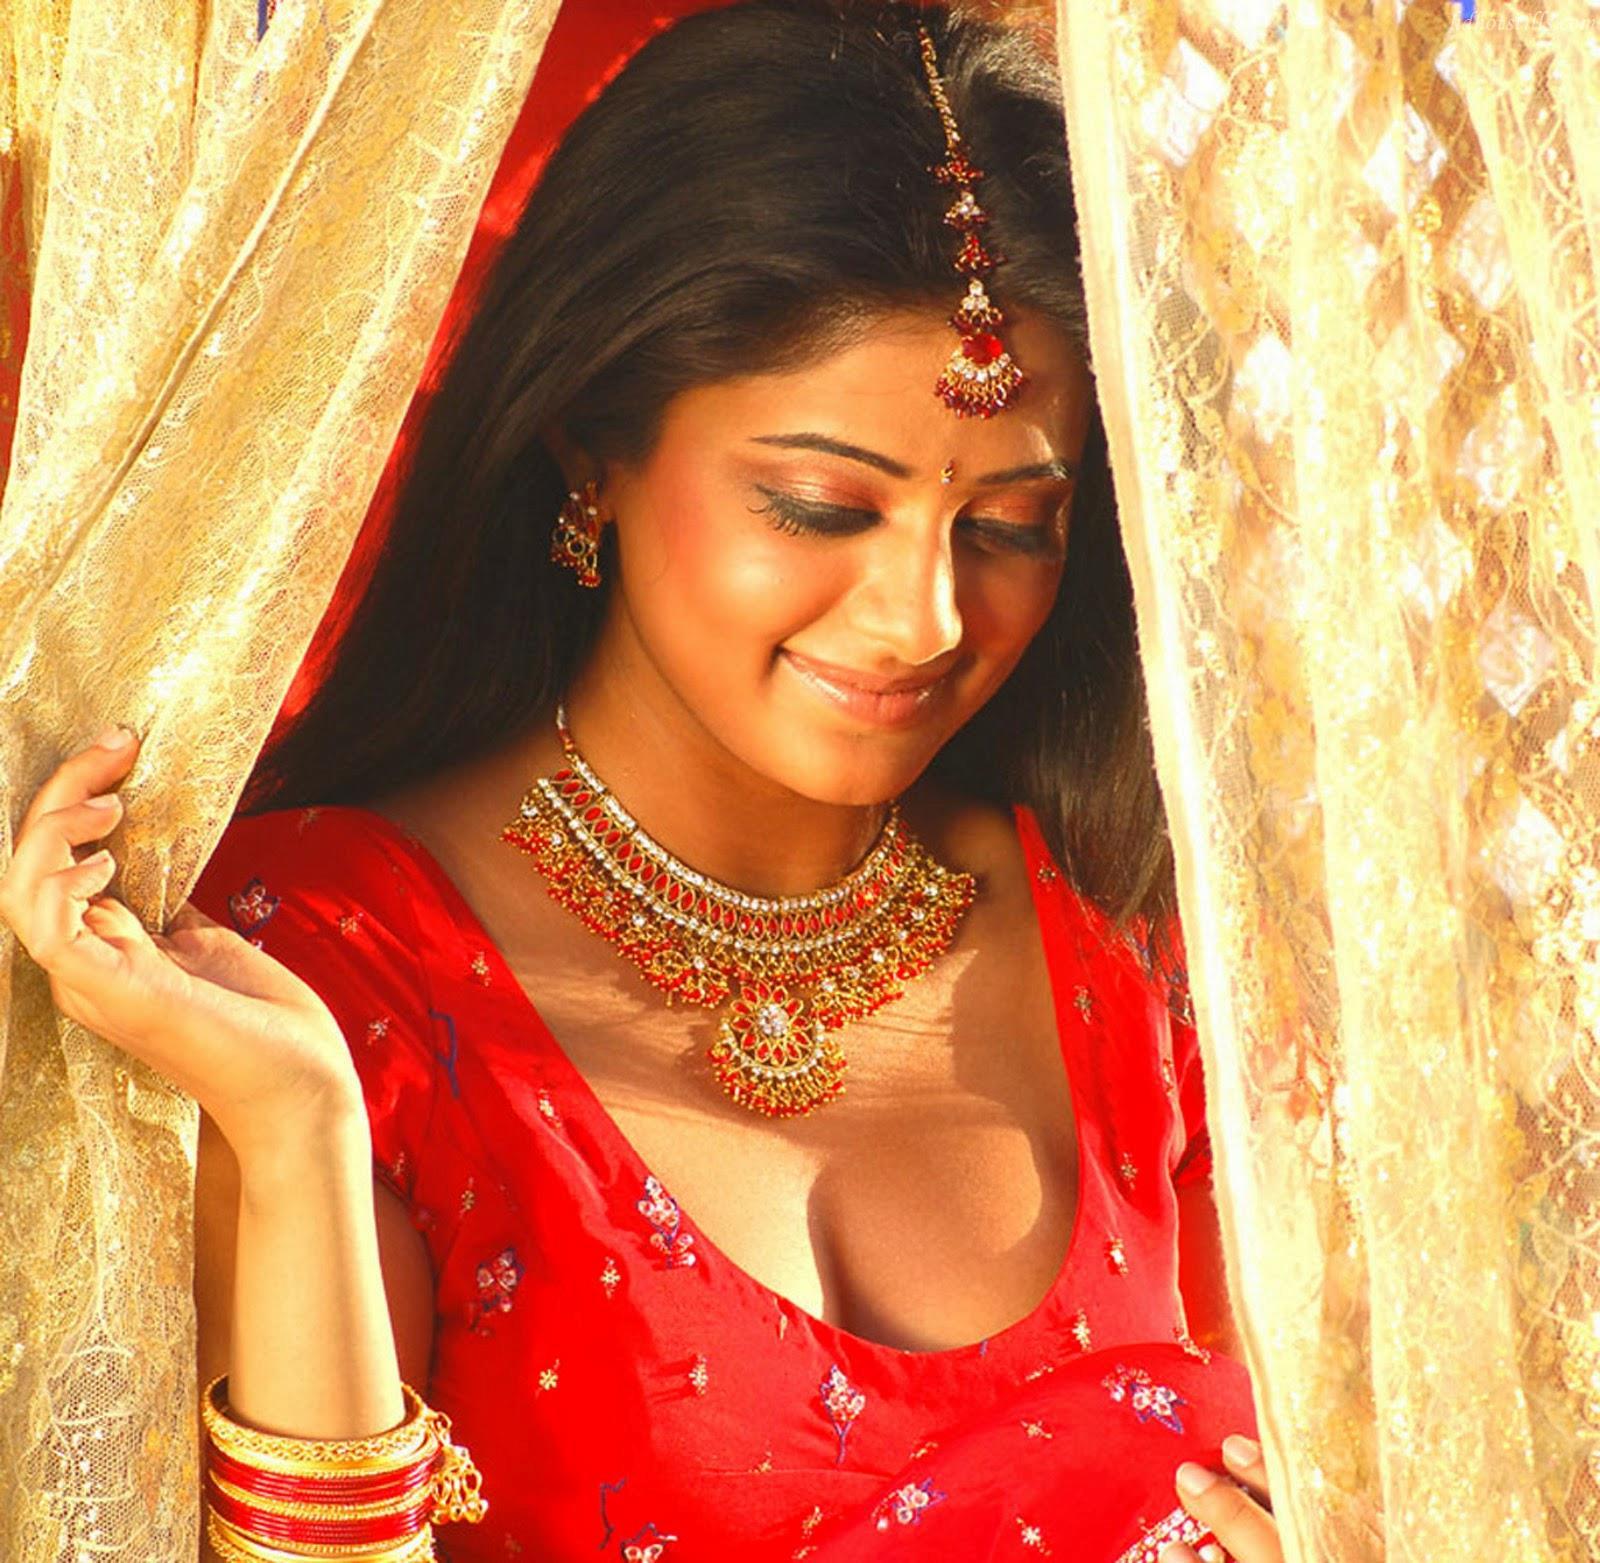 Priyamani Hot Pics in Saree 2016 - best South Indian Actress